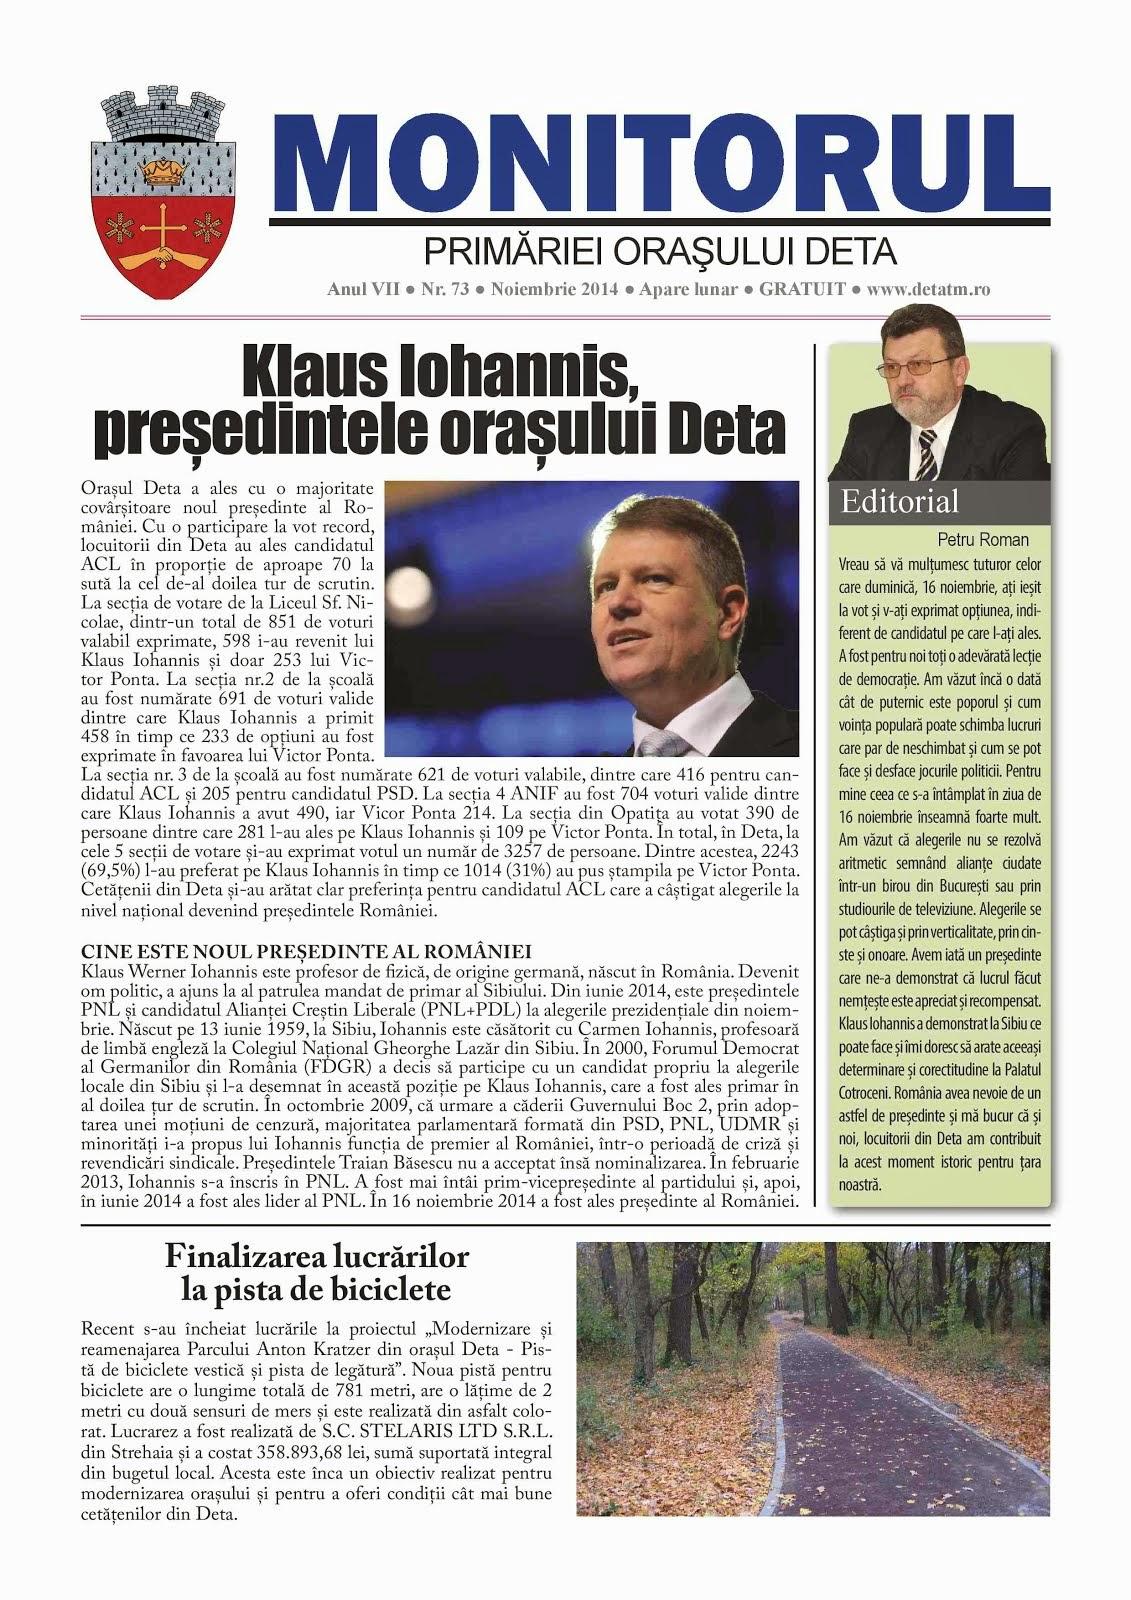 Monitorul - noiembrie 2014